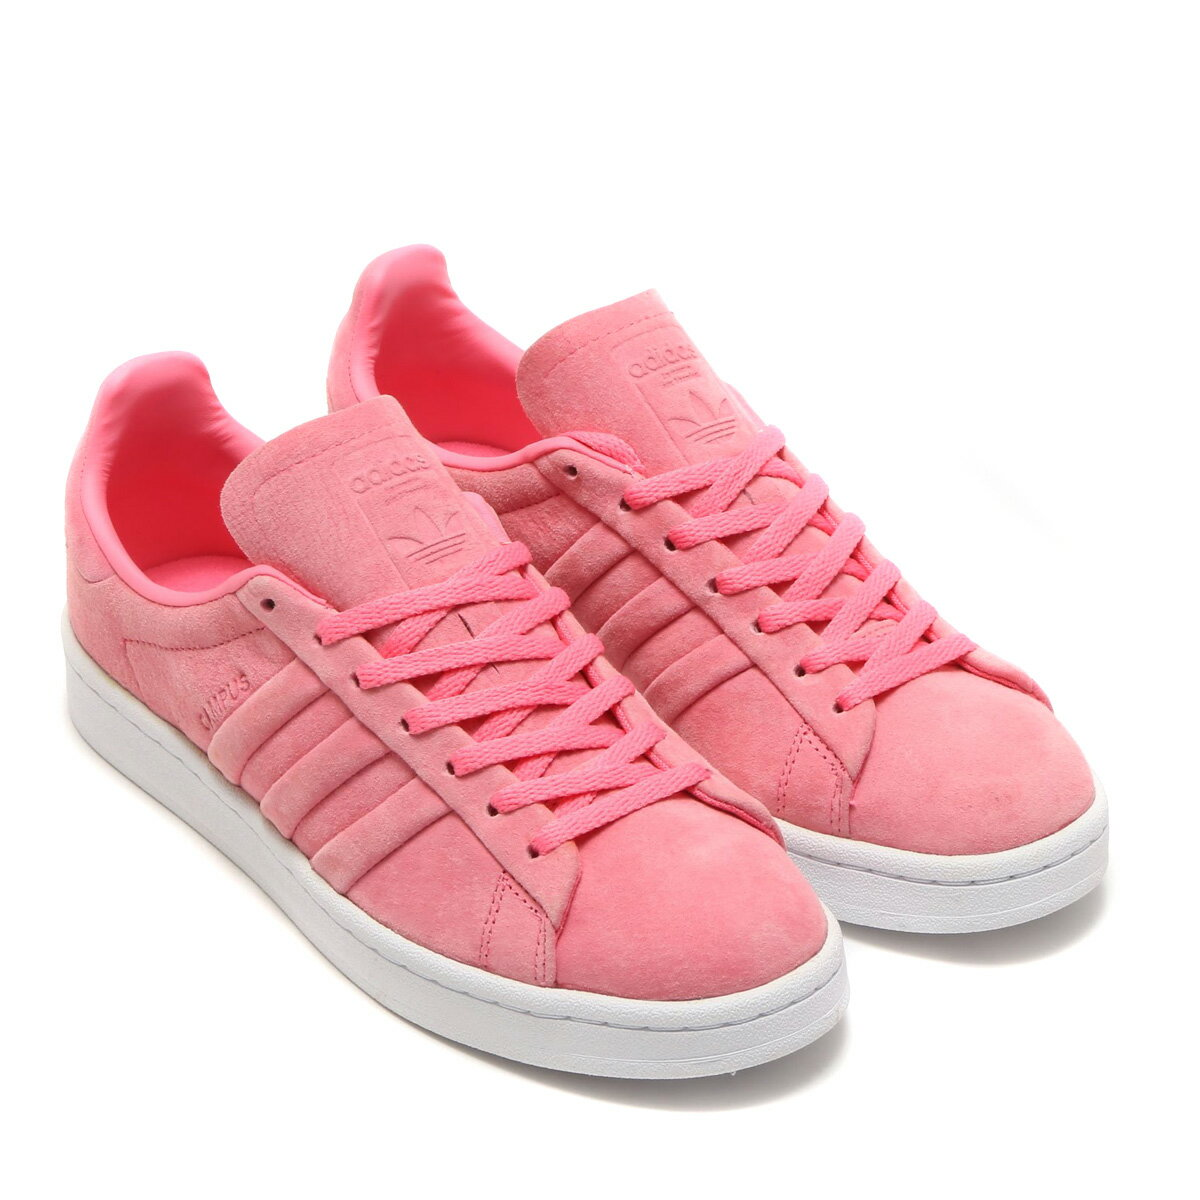 adidas Originals CAMPUS STITCH AND TURN W (アディダス オリジナルス キャンパス ステッチ アンド ターン W) Chalk Pink/Chalk Pink/Gold Metallic【レディース スニーカー】18SS-S